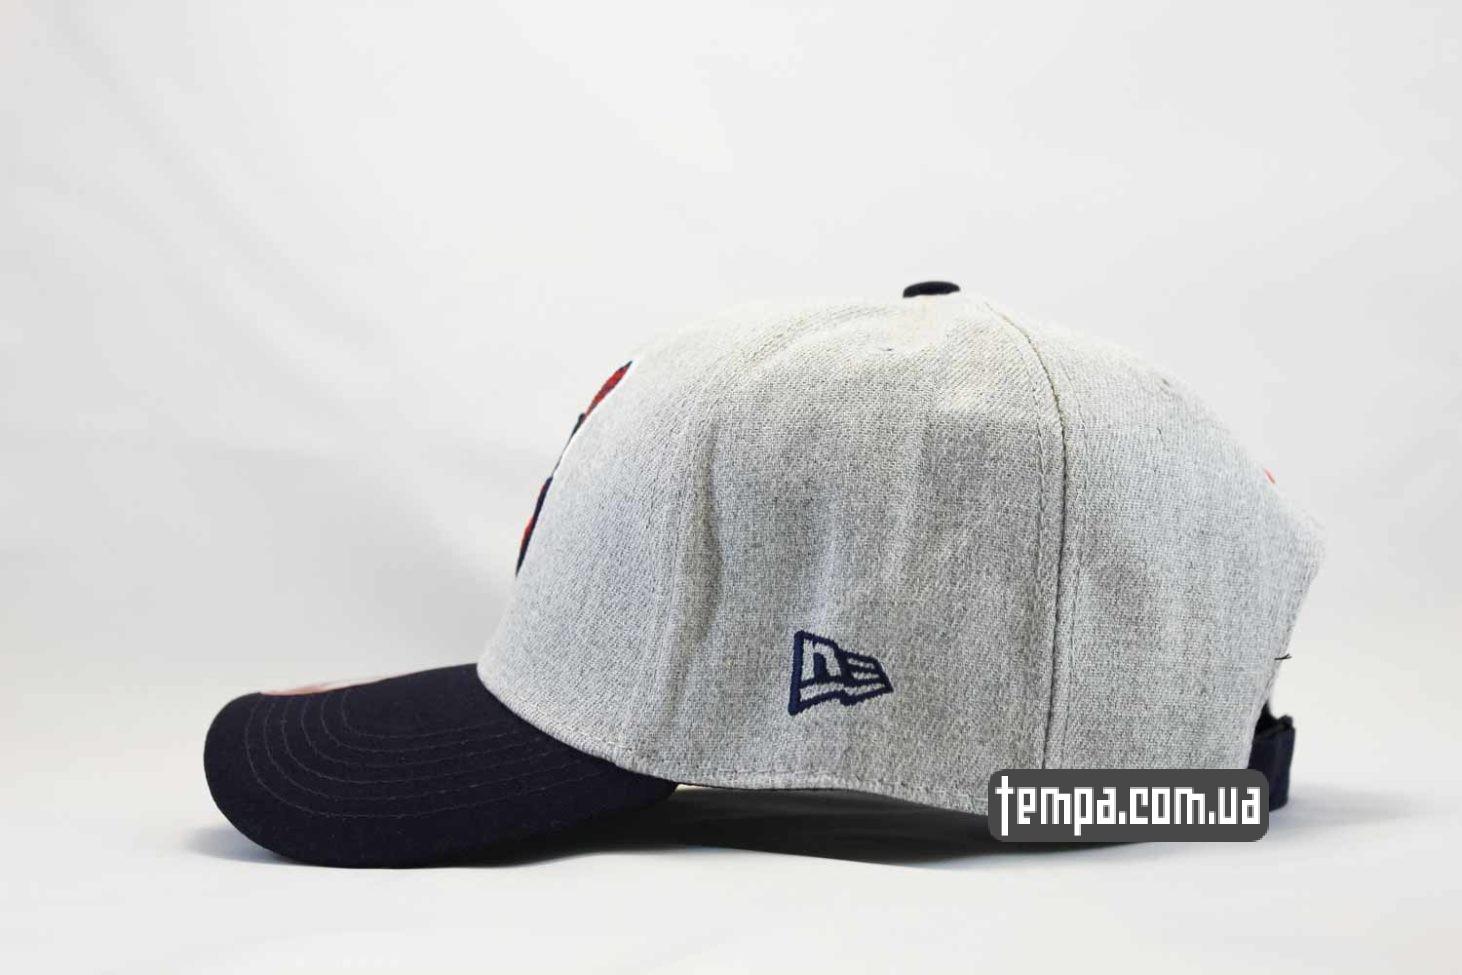 new era магазин кепка бейсболка снепьек Cleveland Indians с индейцем